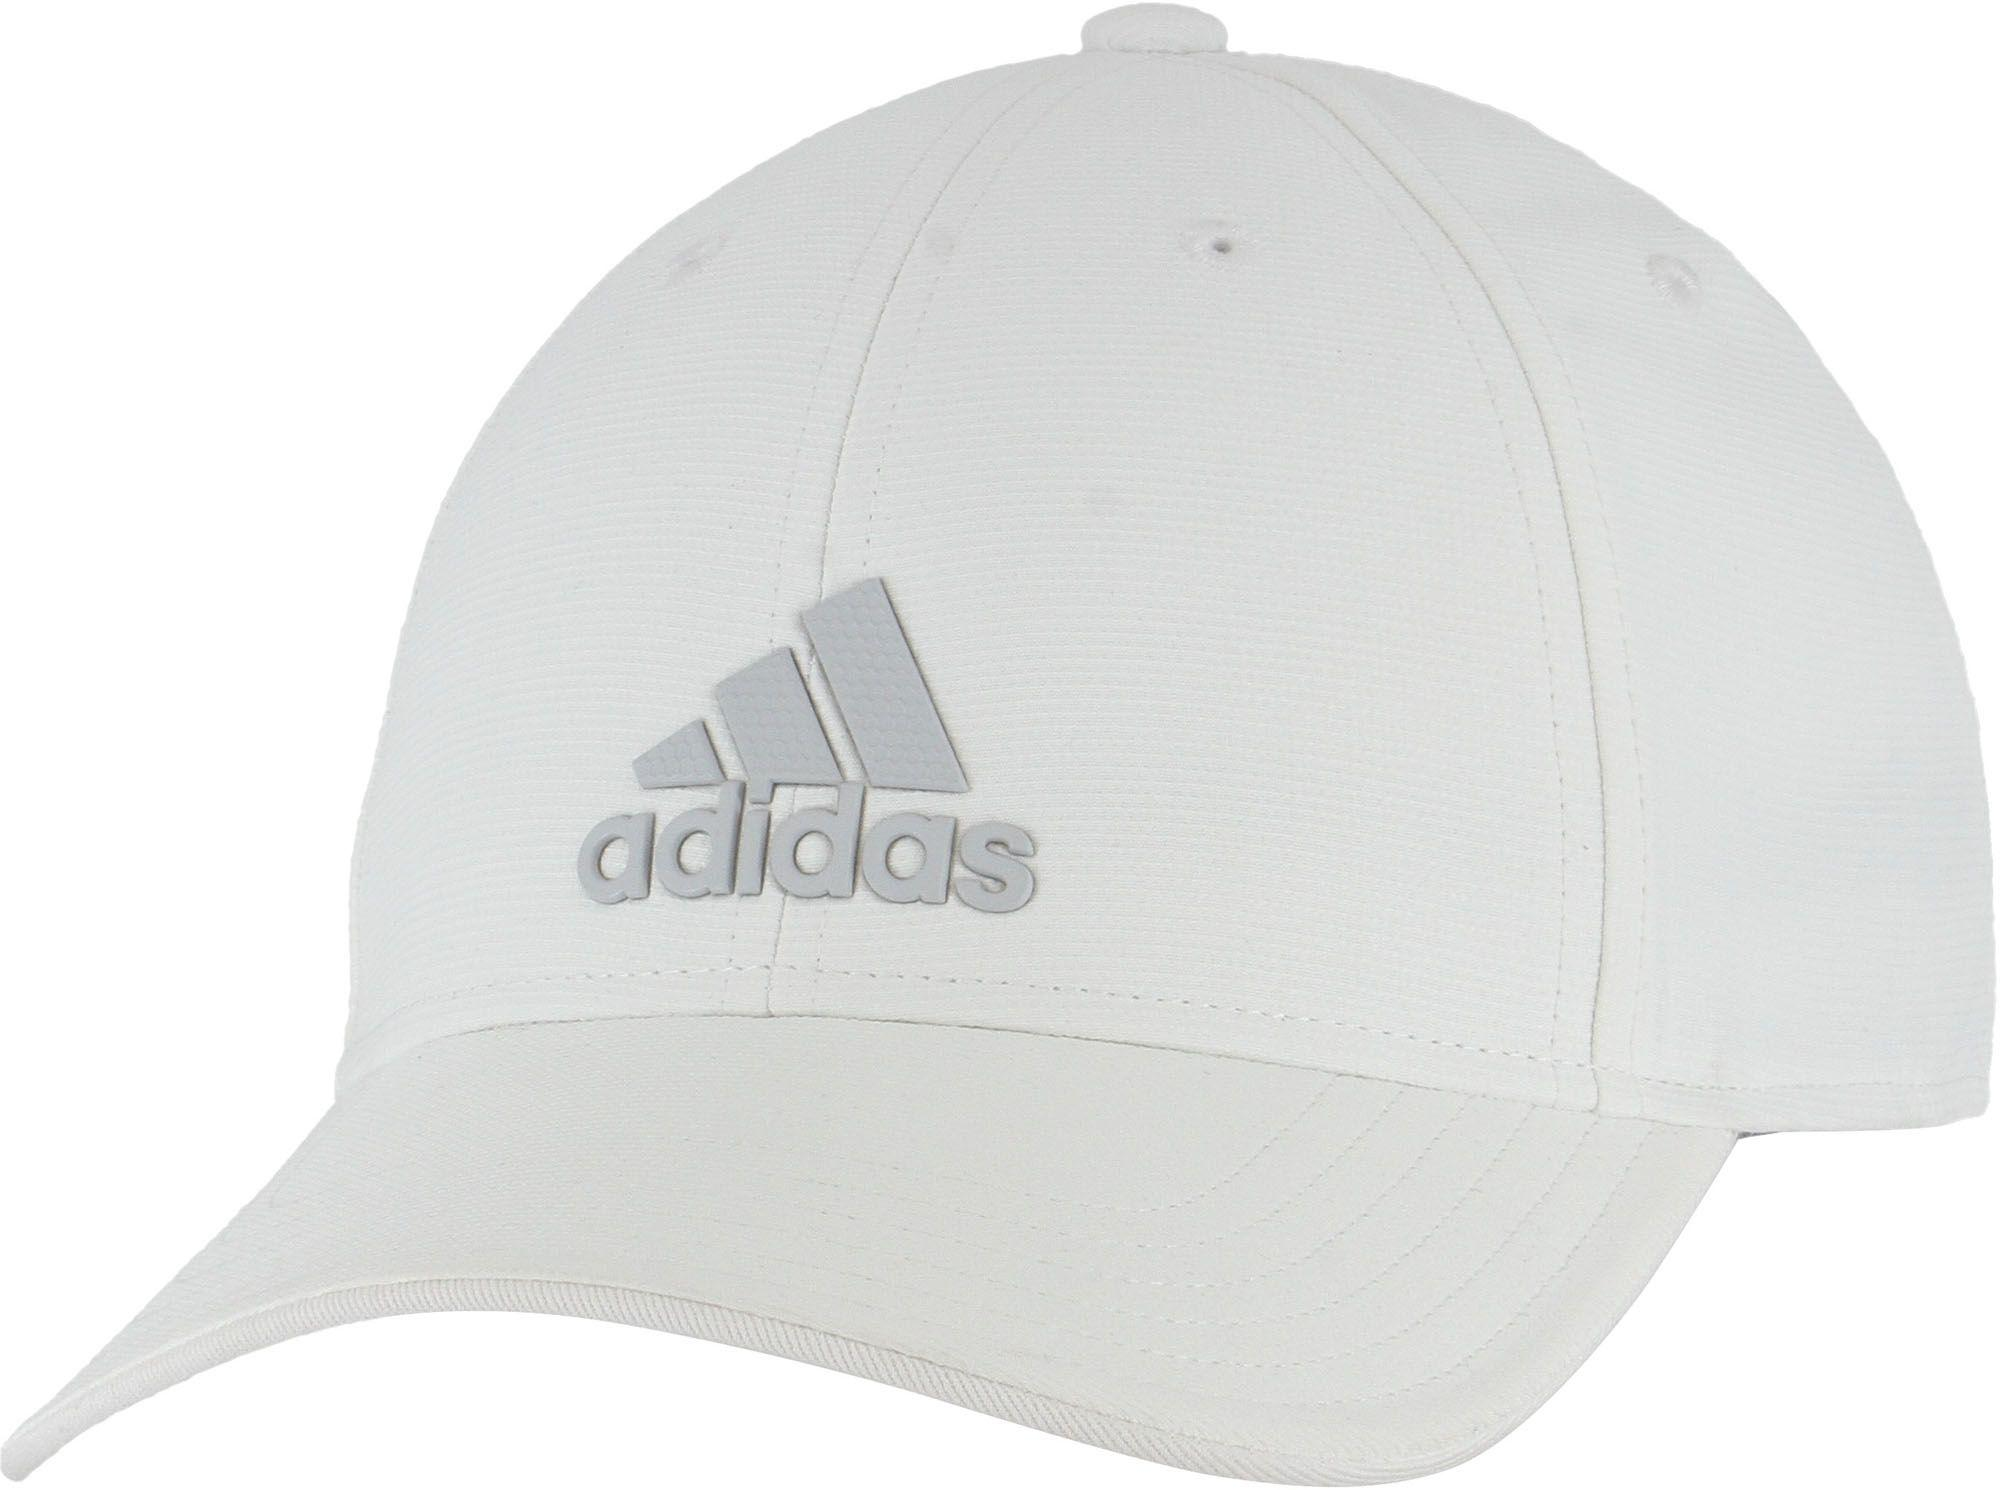 b133d2eef7d Adidas - Multicolor Decision Hat for Men - Lyst. View fullscreen